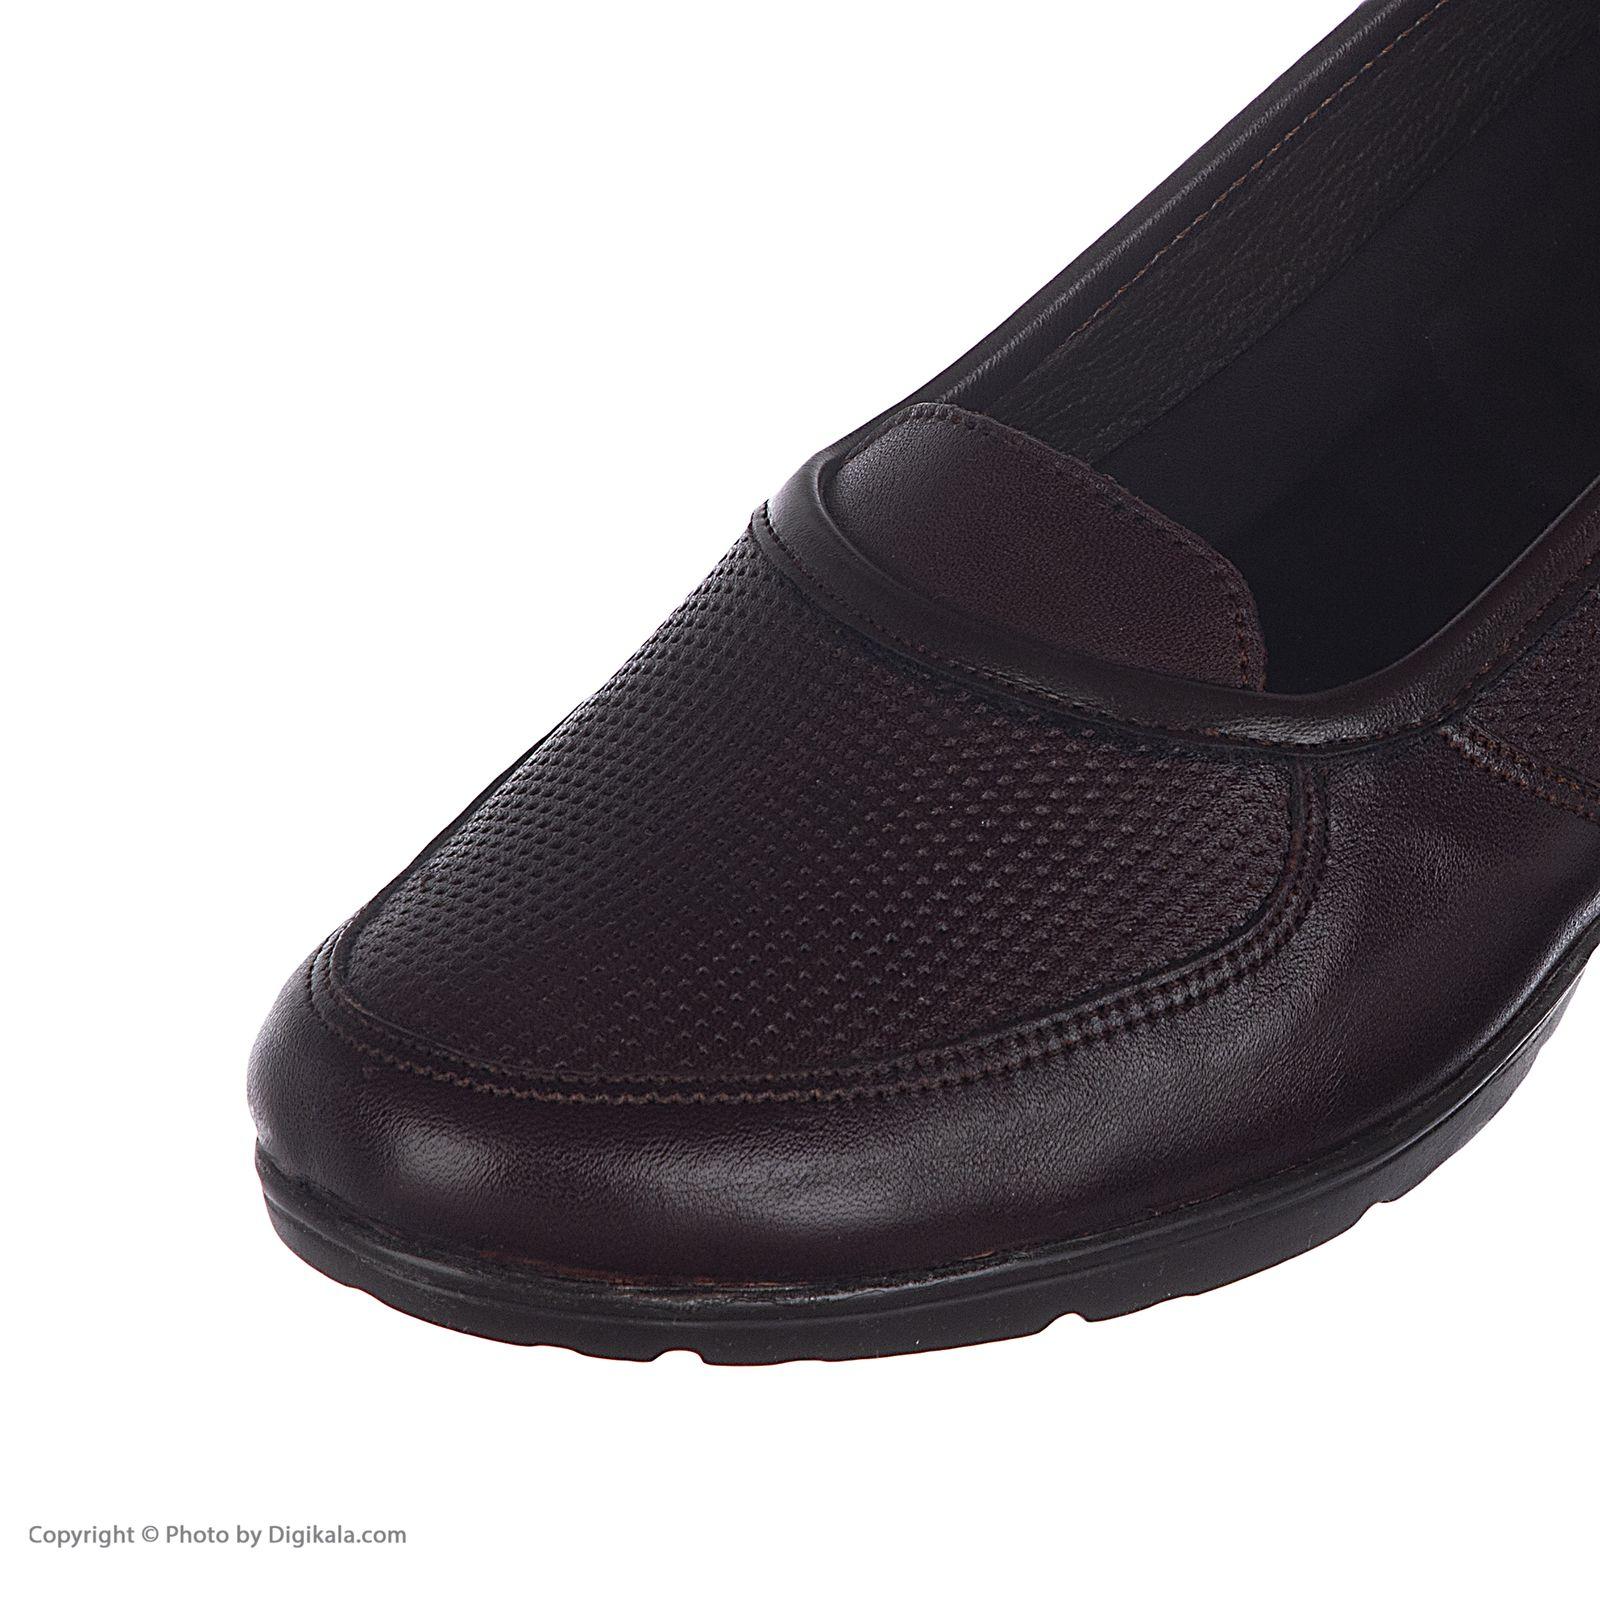 کفش روزمره زنانه دانادل مدل 6602A500104 -  - 6